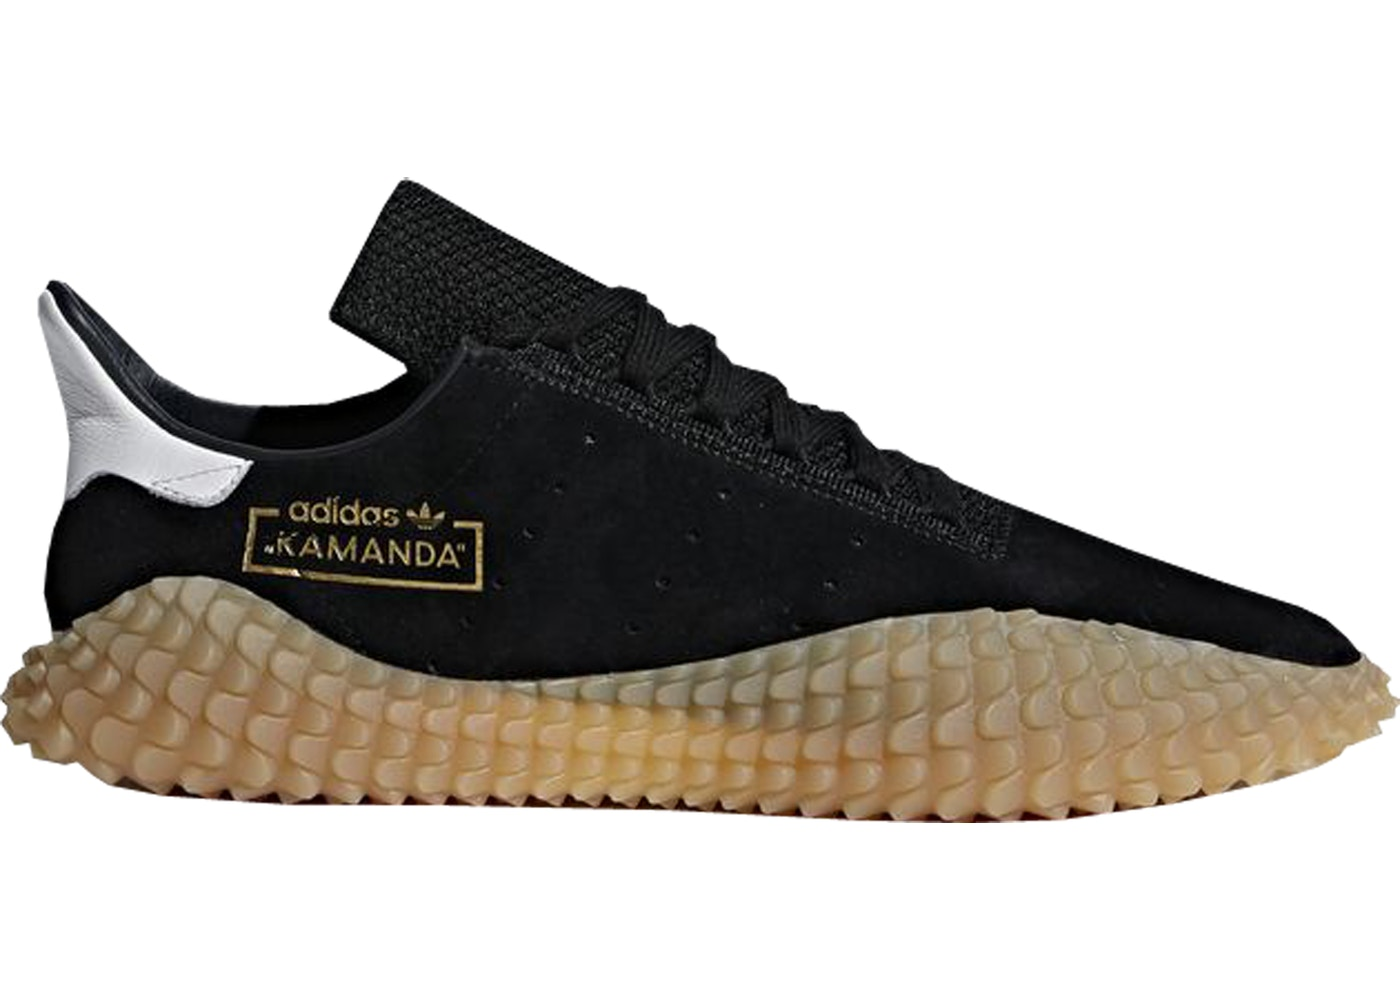 Adidas Kamanda Size US 9.5/UK 9 Black Gum *Brand New* Sold Out 100% Authentic